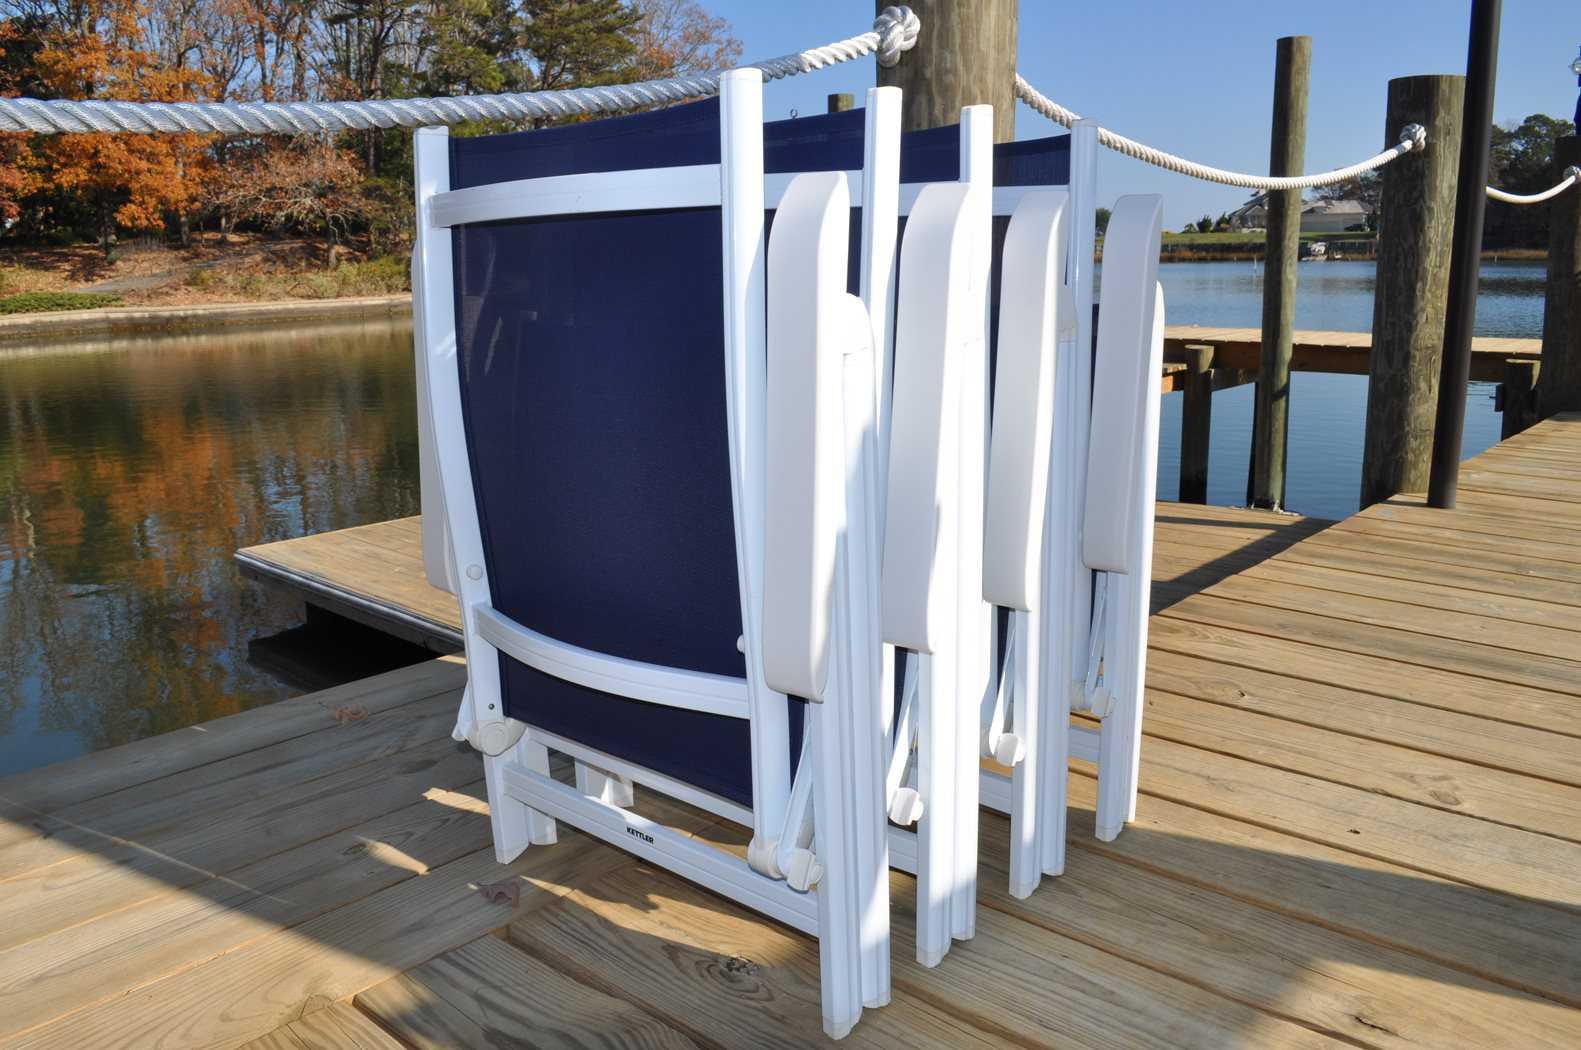 Kettler Basic Plus Multi Position Arm Chair 301201 0000 ~ 08193340_Liegestuhl Kettler Basic Plus